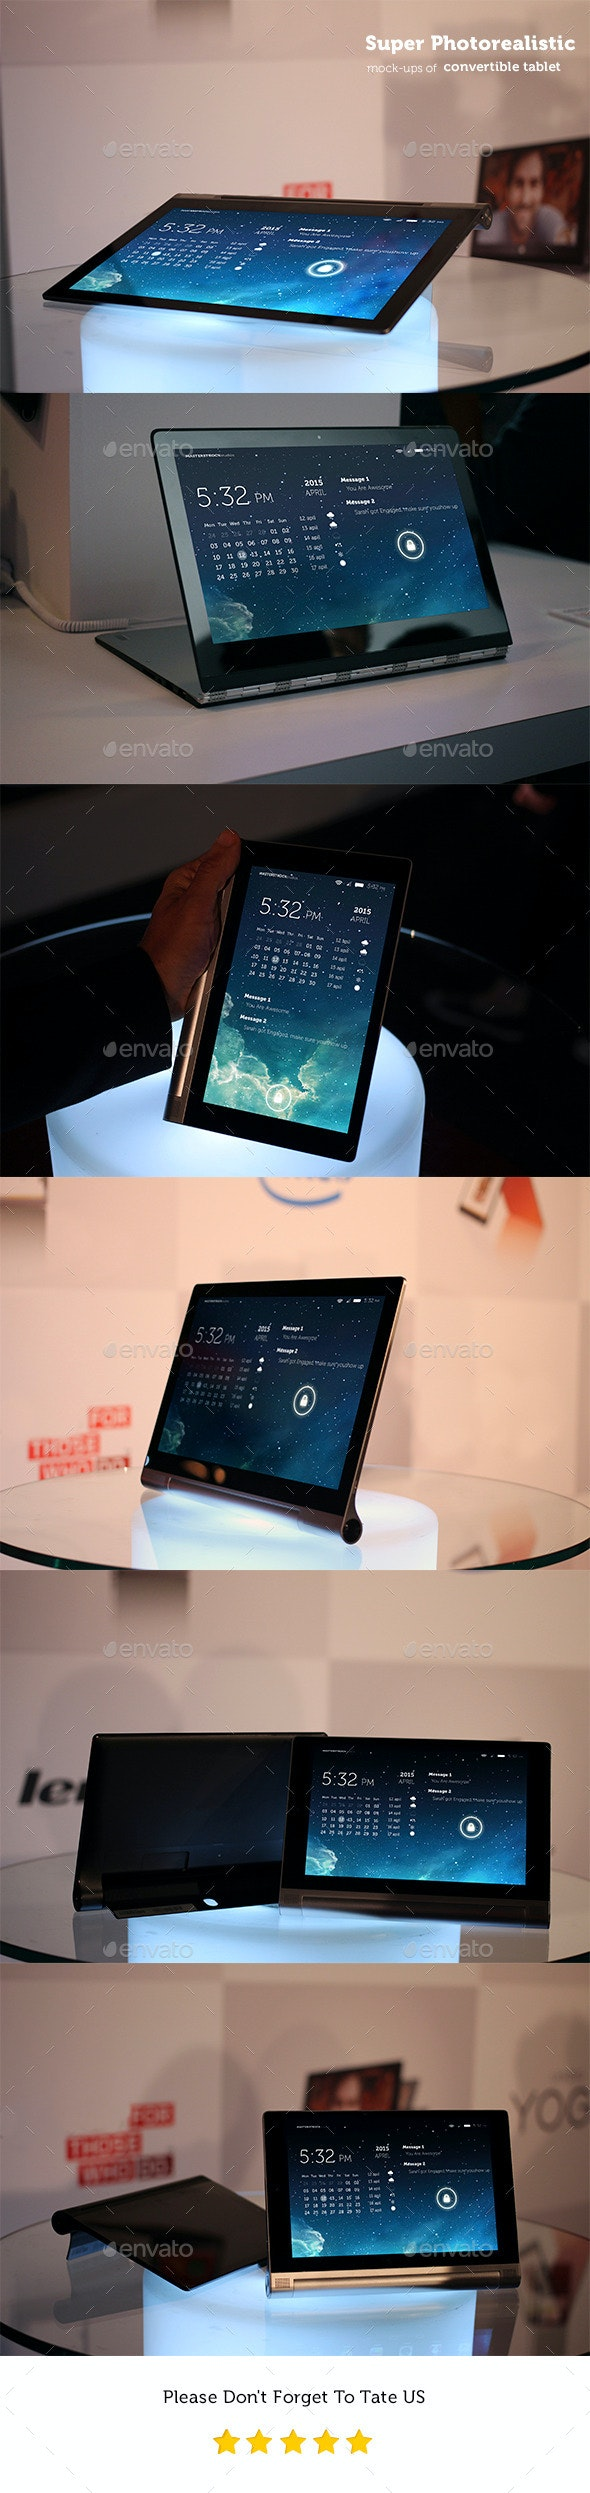 Photorealistic Pad-Tablet Mockups  - Mobile Displays